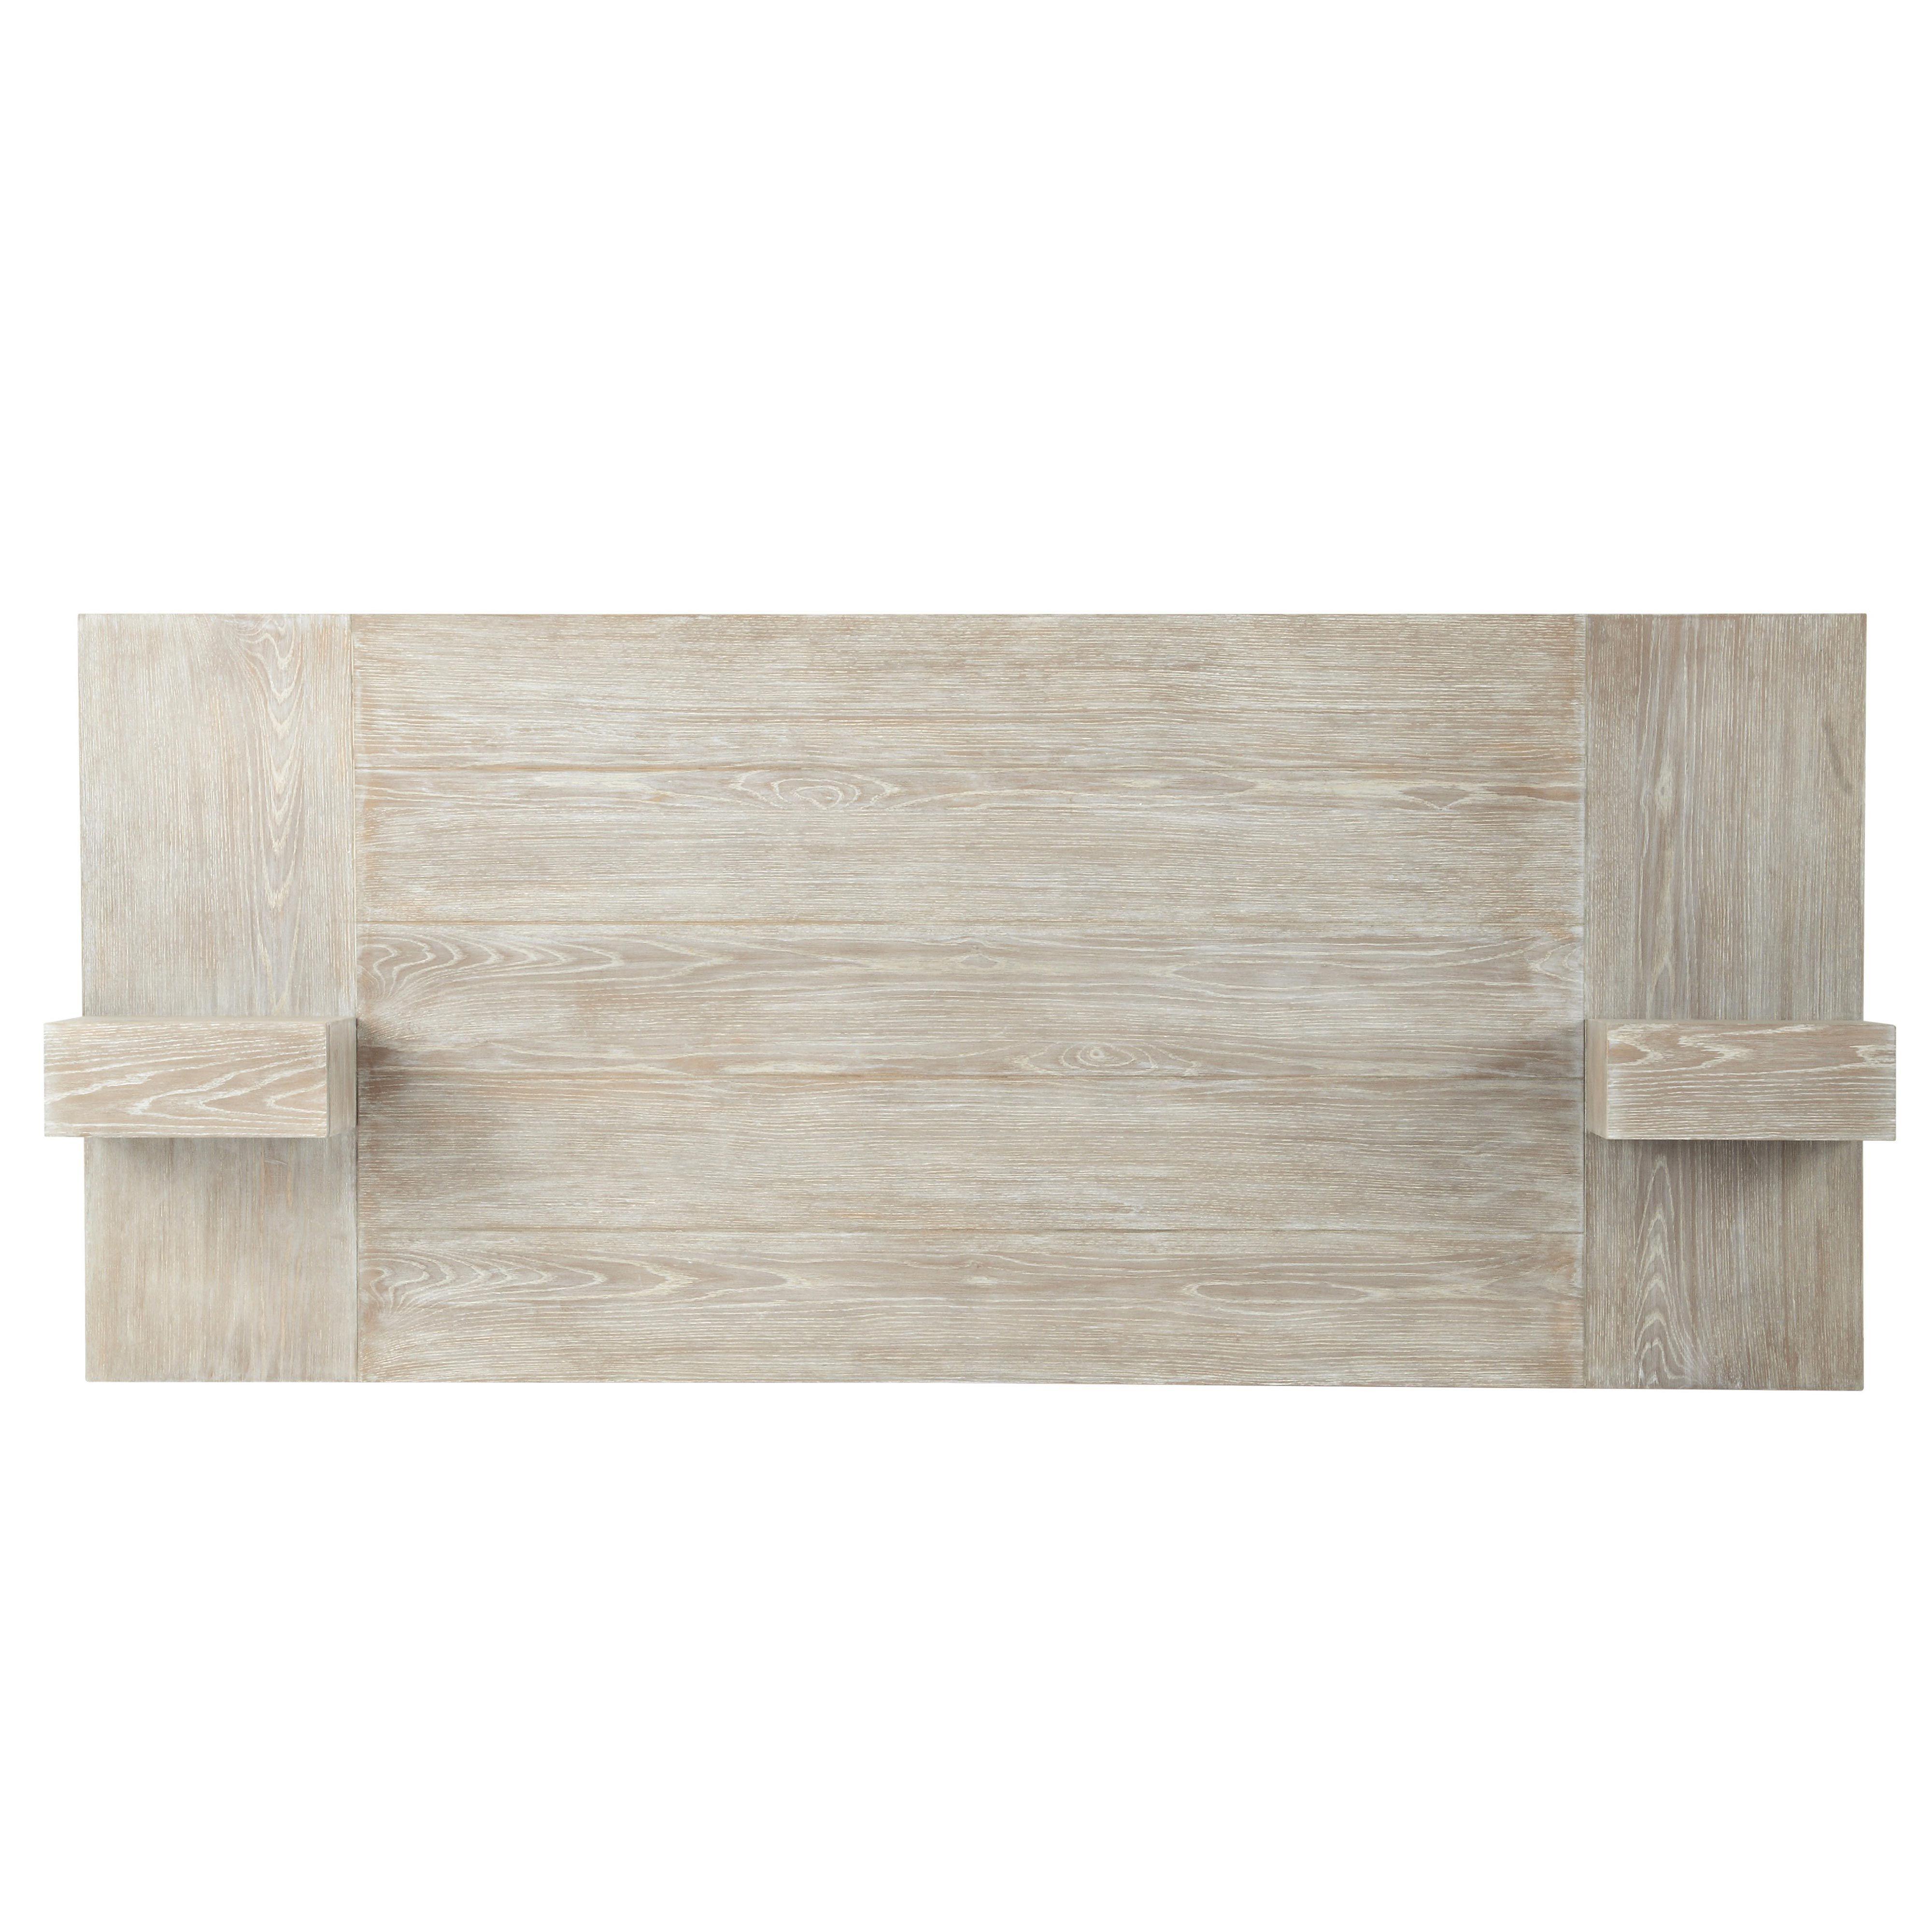 Tªte de lit en bois L 140 cm